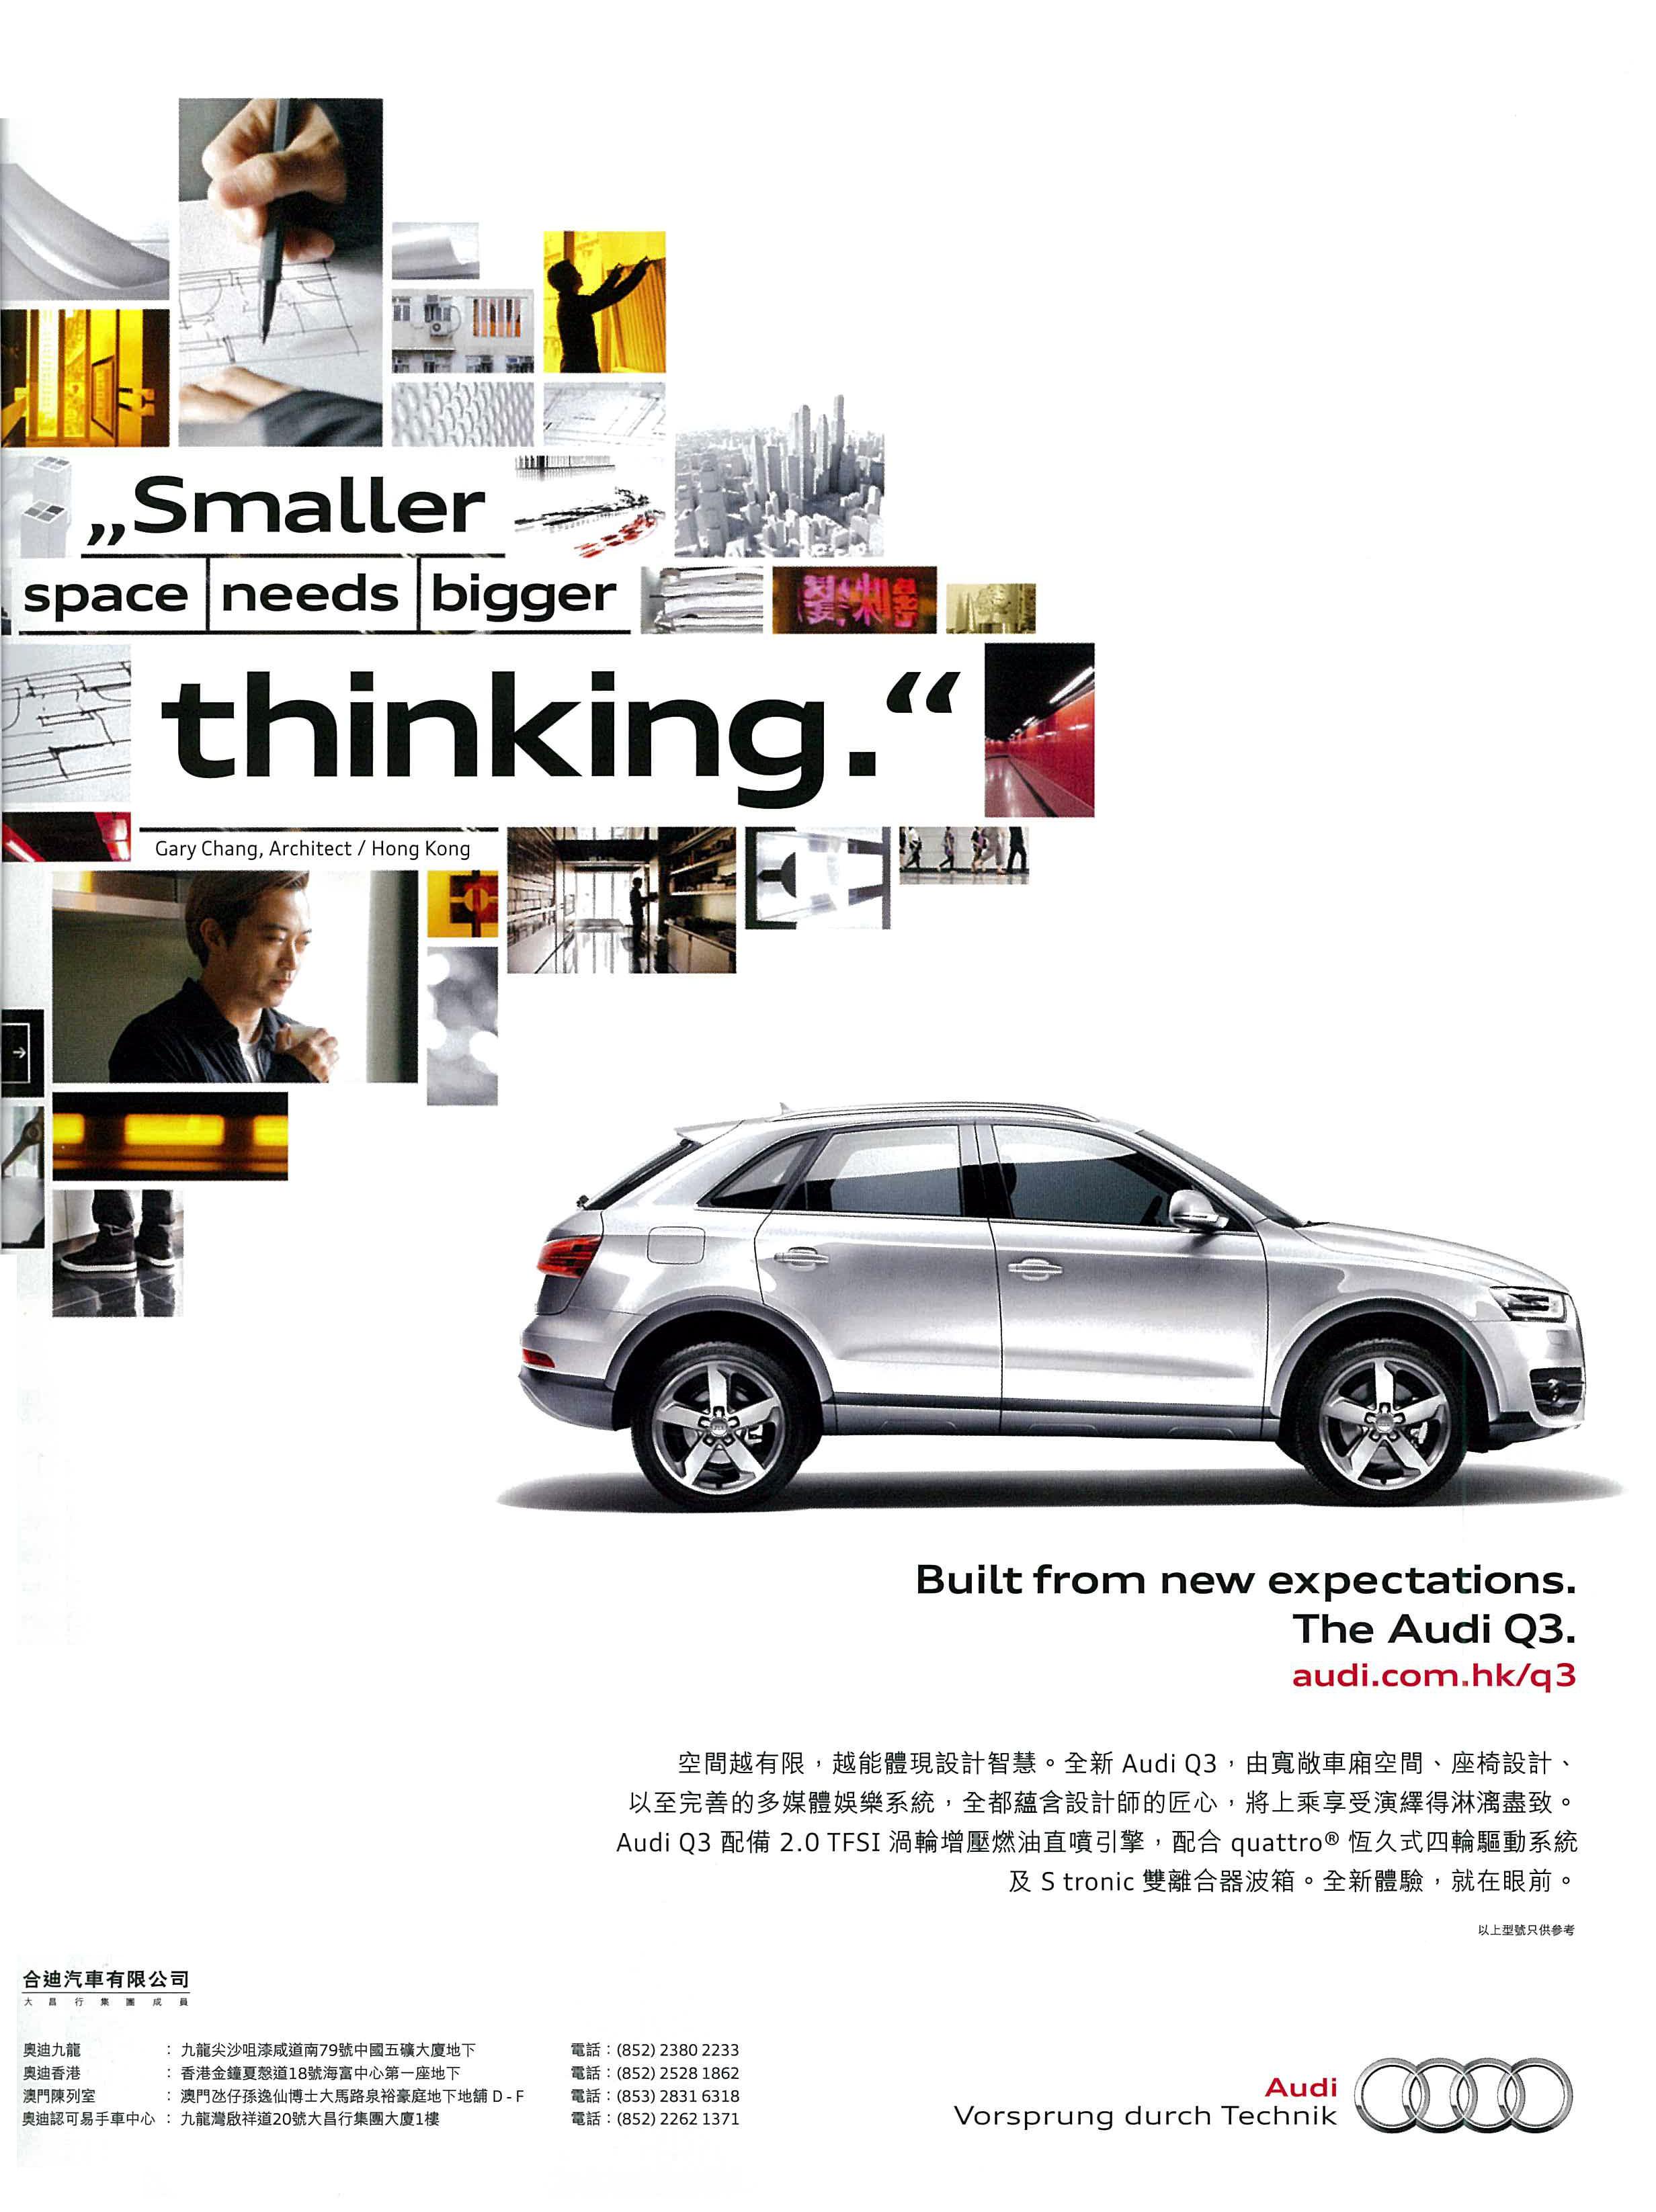 Audi Q3 Advertisement